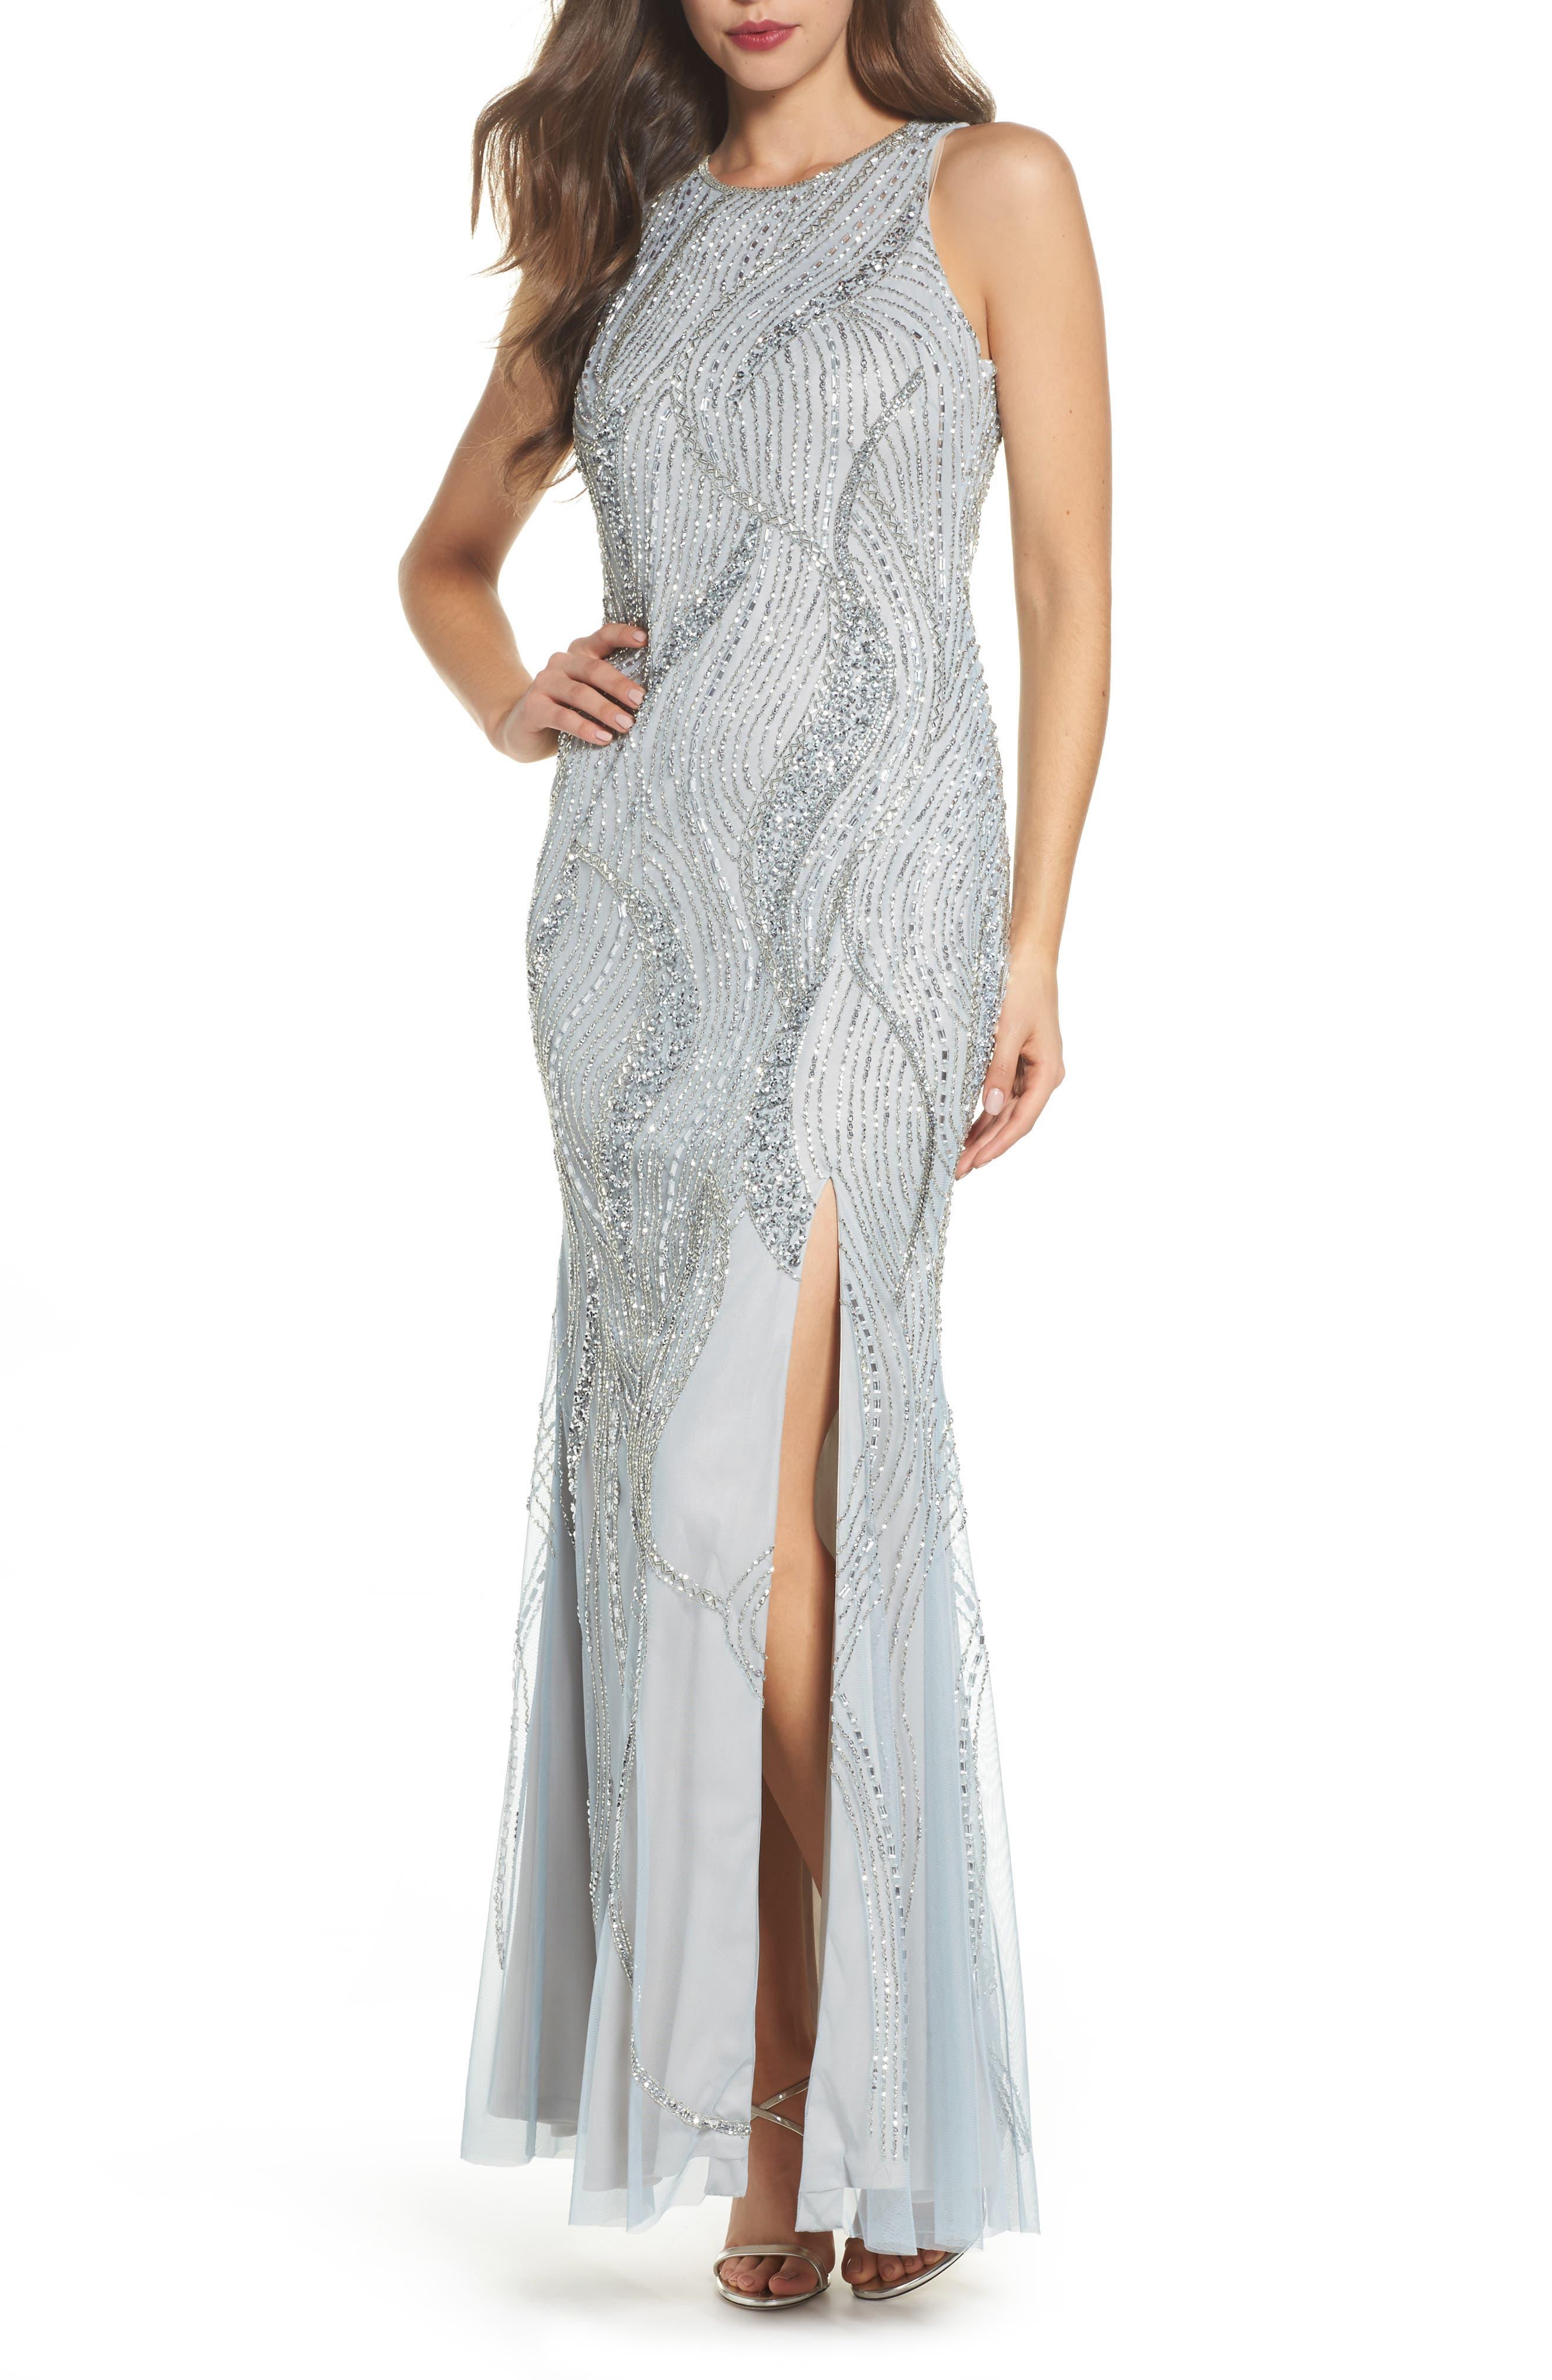 Swirl Beaded Long Dress,                         Main,                         color, Blue Heather/ Silver